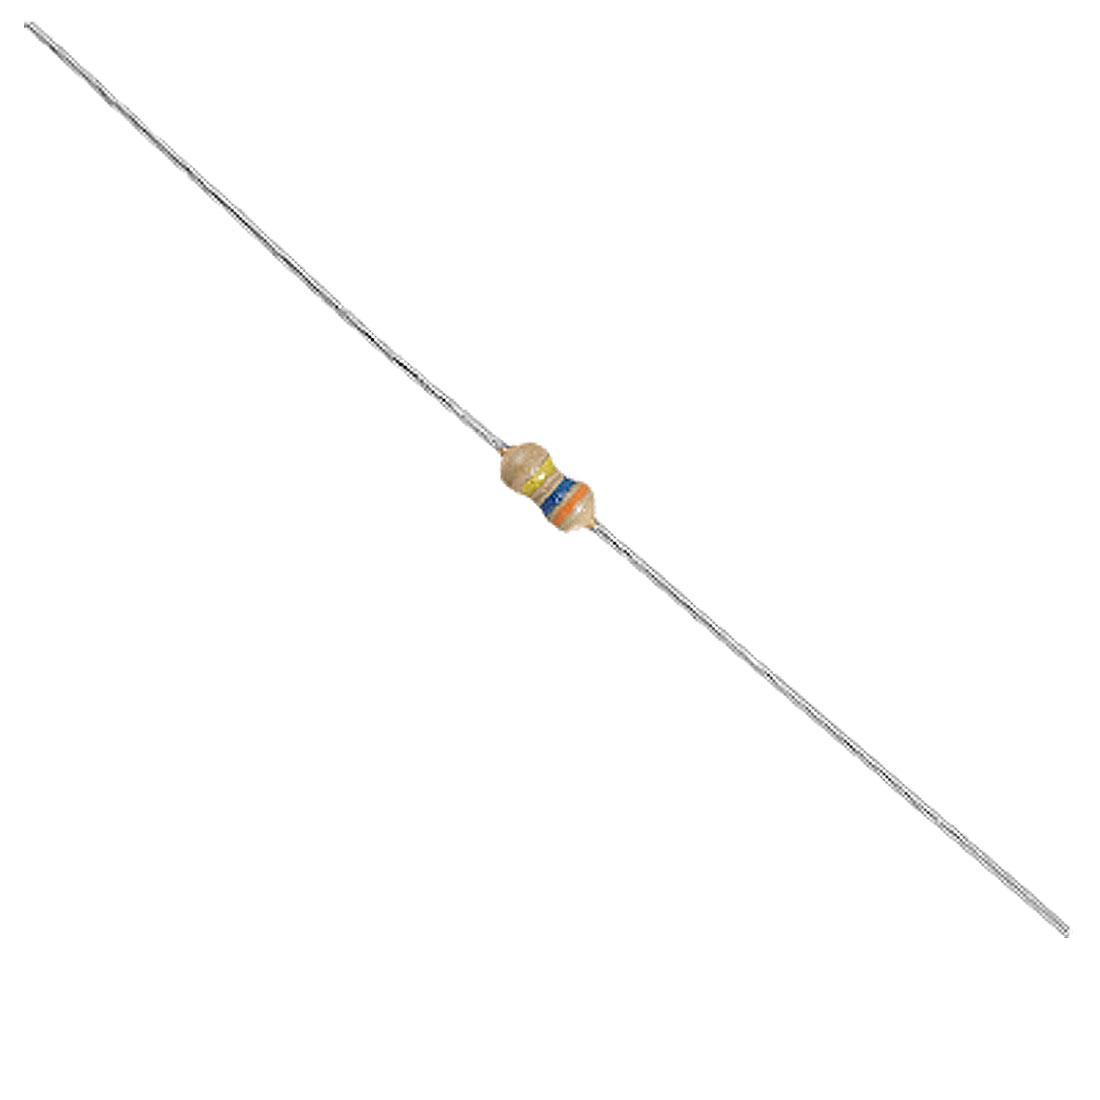 1/6W Watt 360K ohm 5% Axial Carbon Film Resistor x1000